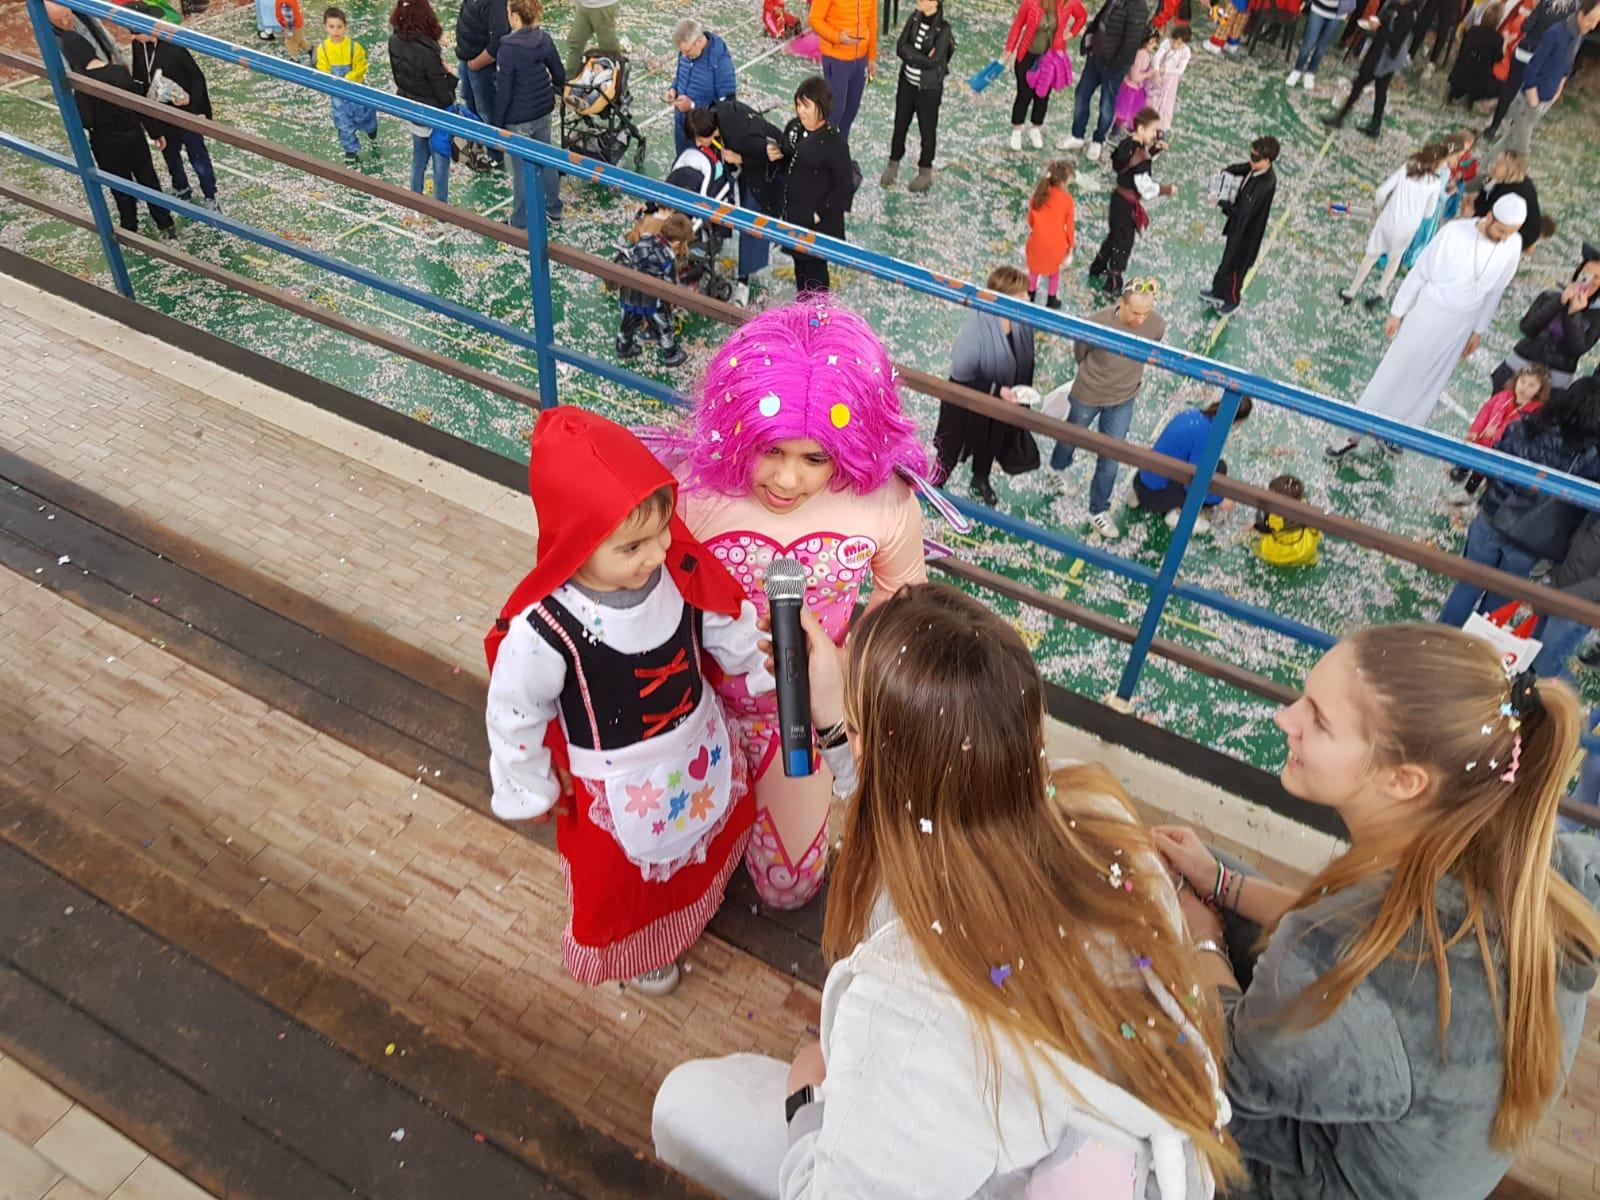 Baraonda Carnevale 2019 (277)